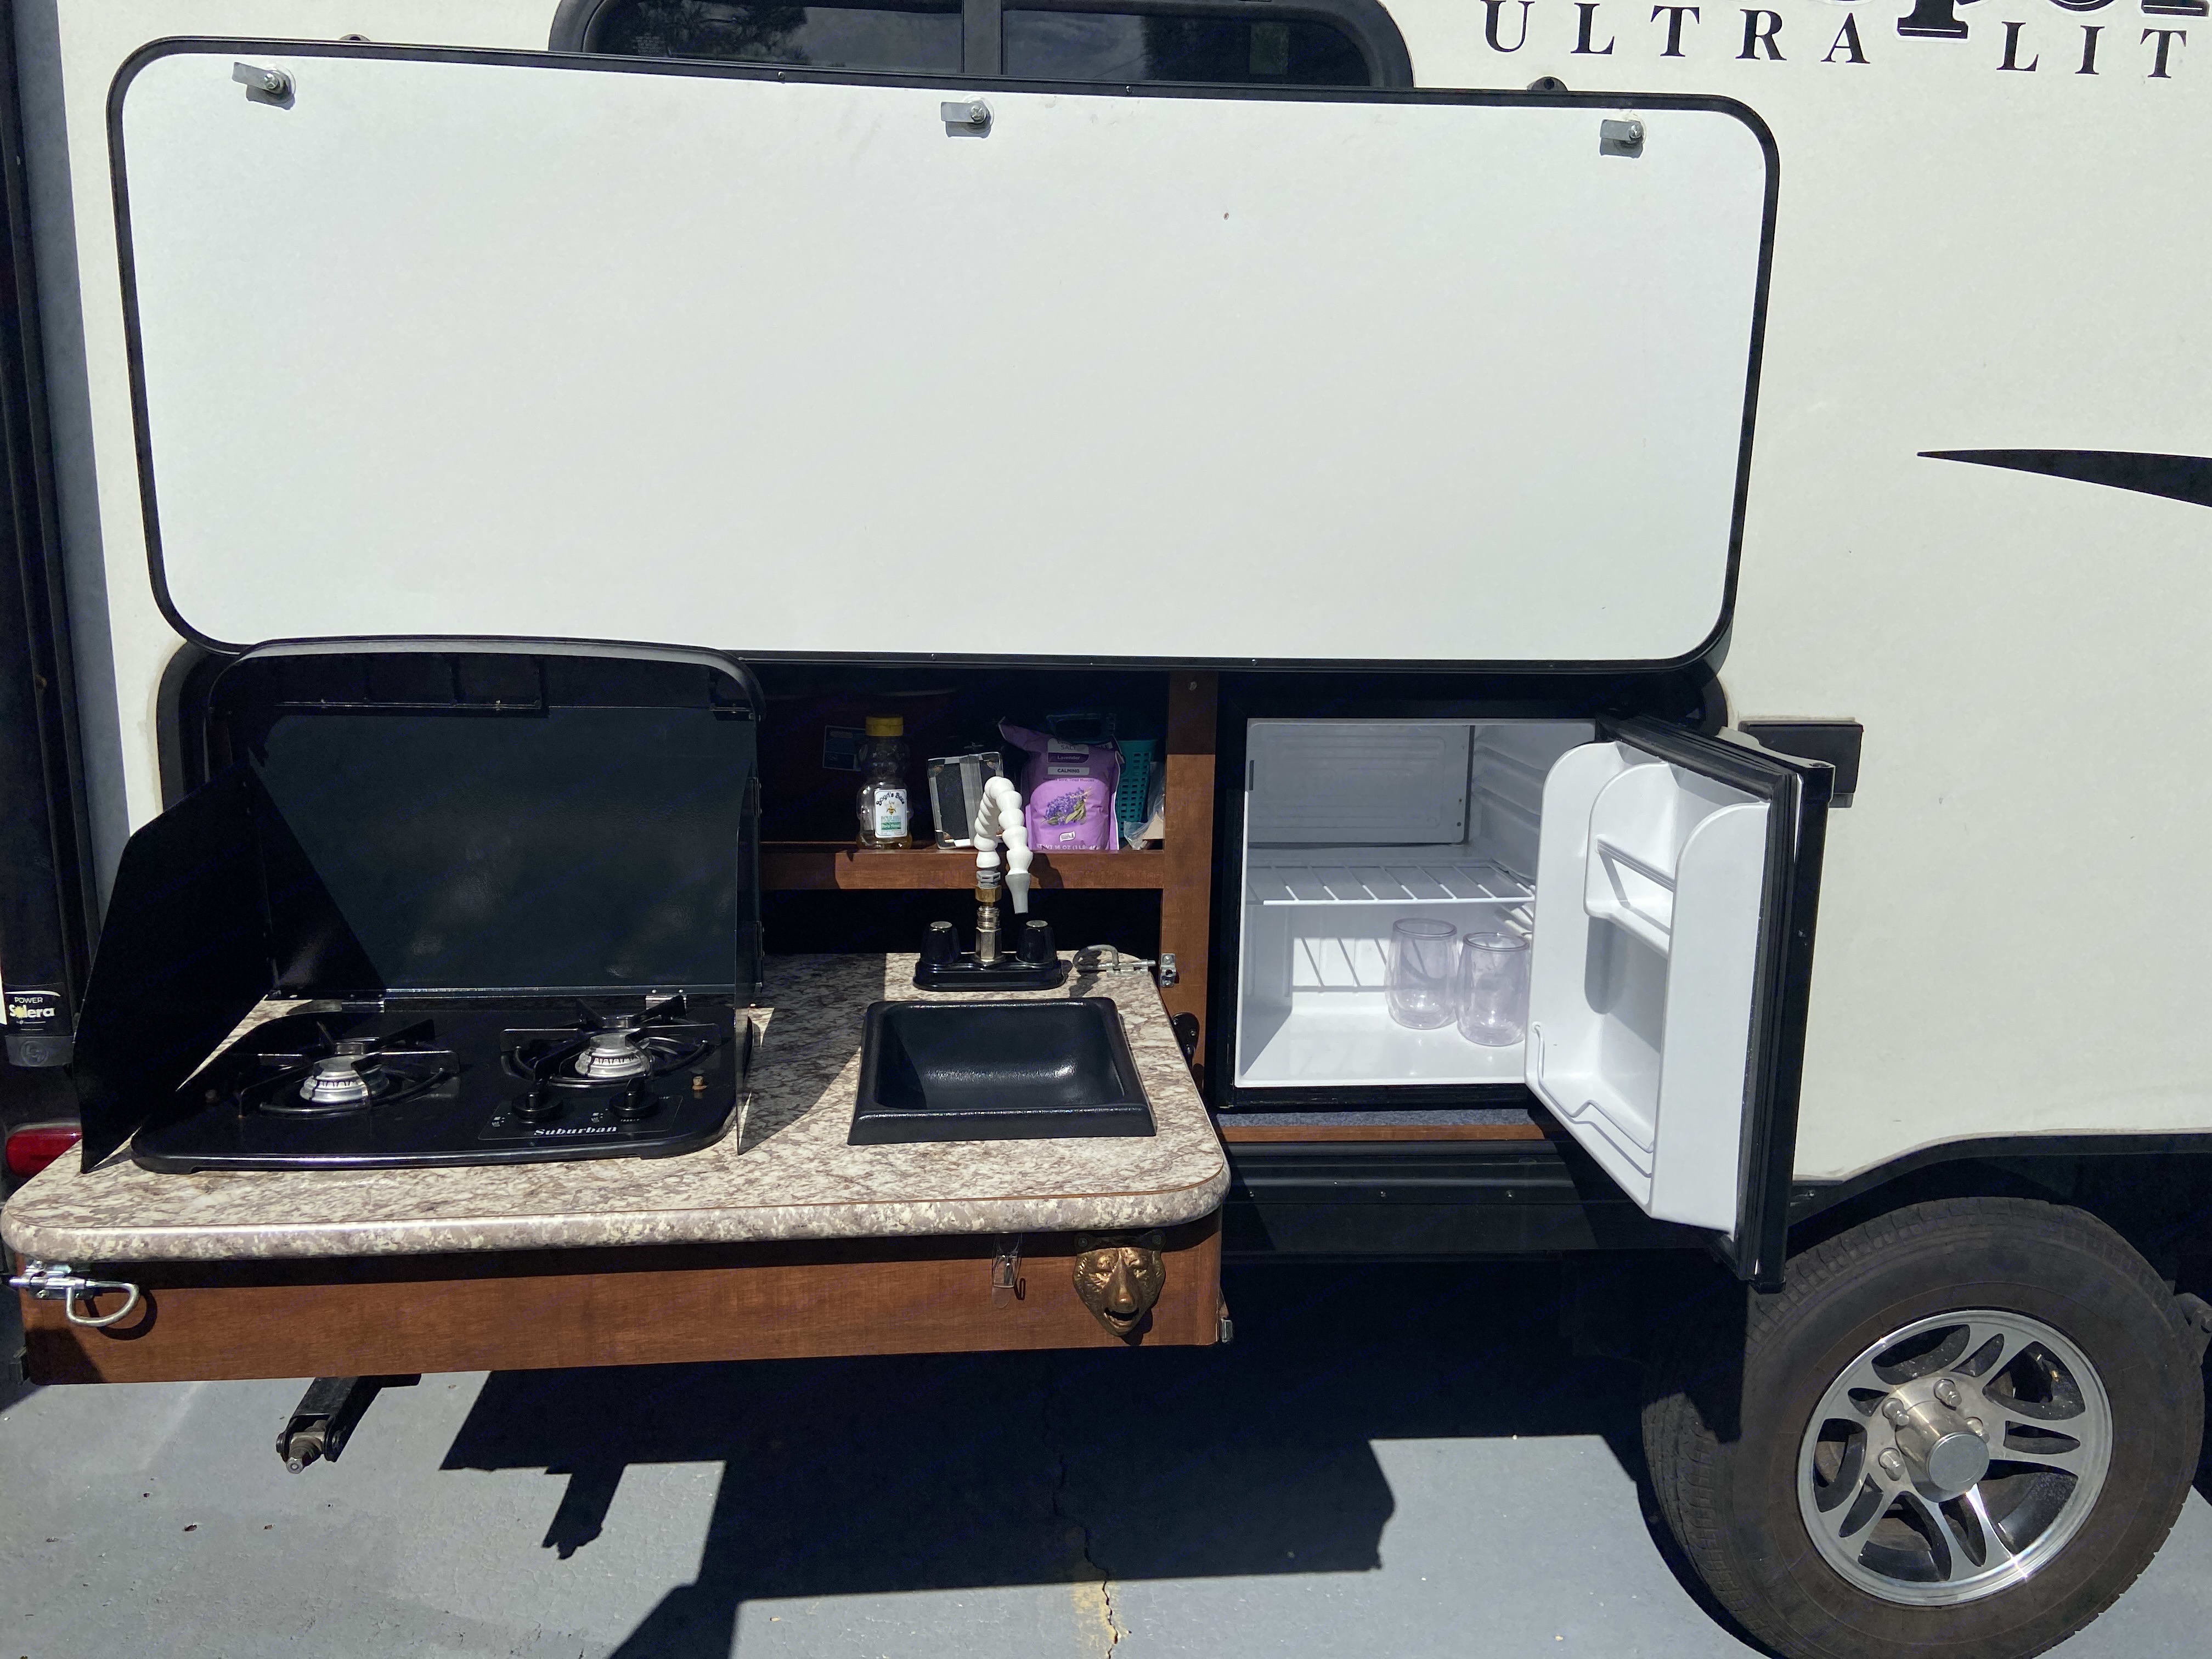 Outdoor kitchen w/ 2 burner gas stove, sink, storage & fridge. Oh, & bottle opener of course.2 exterior outlets too (fan,speaker,lights). Keystone Passport 2018